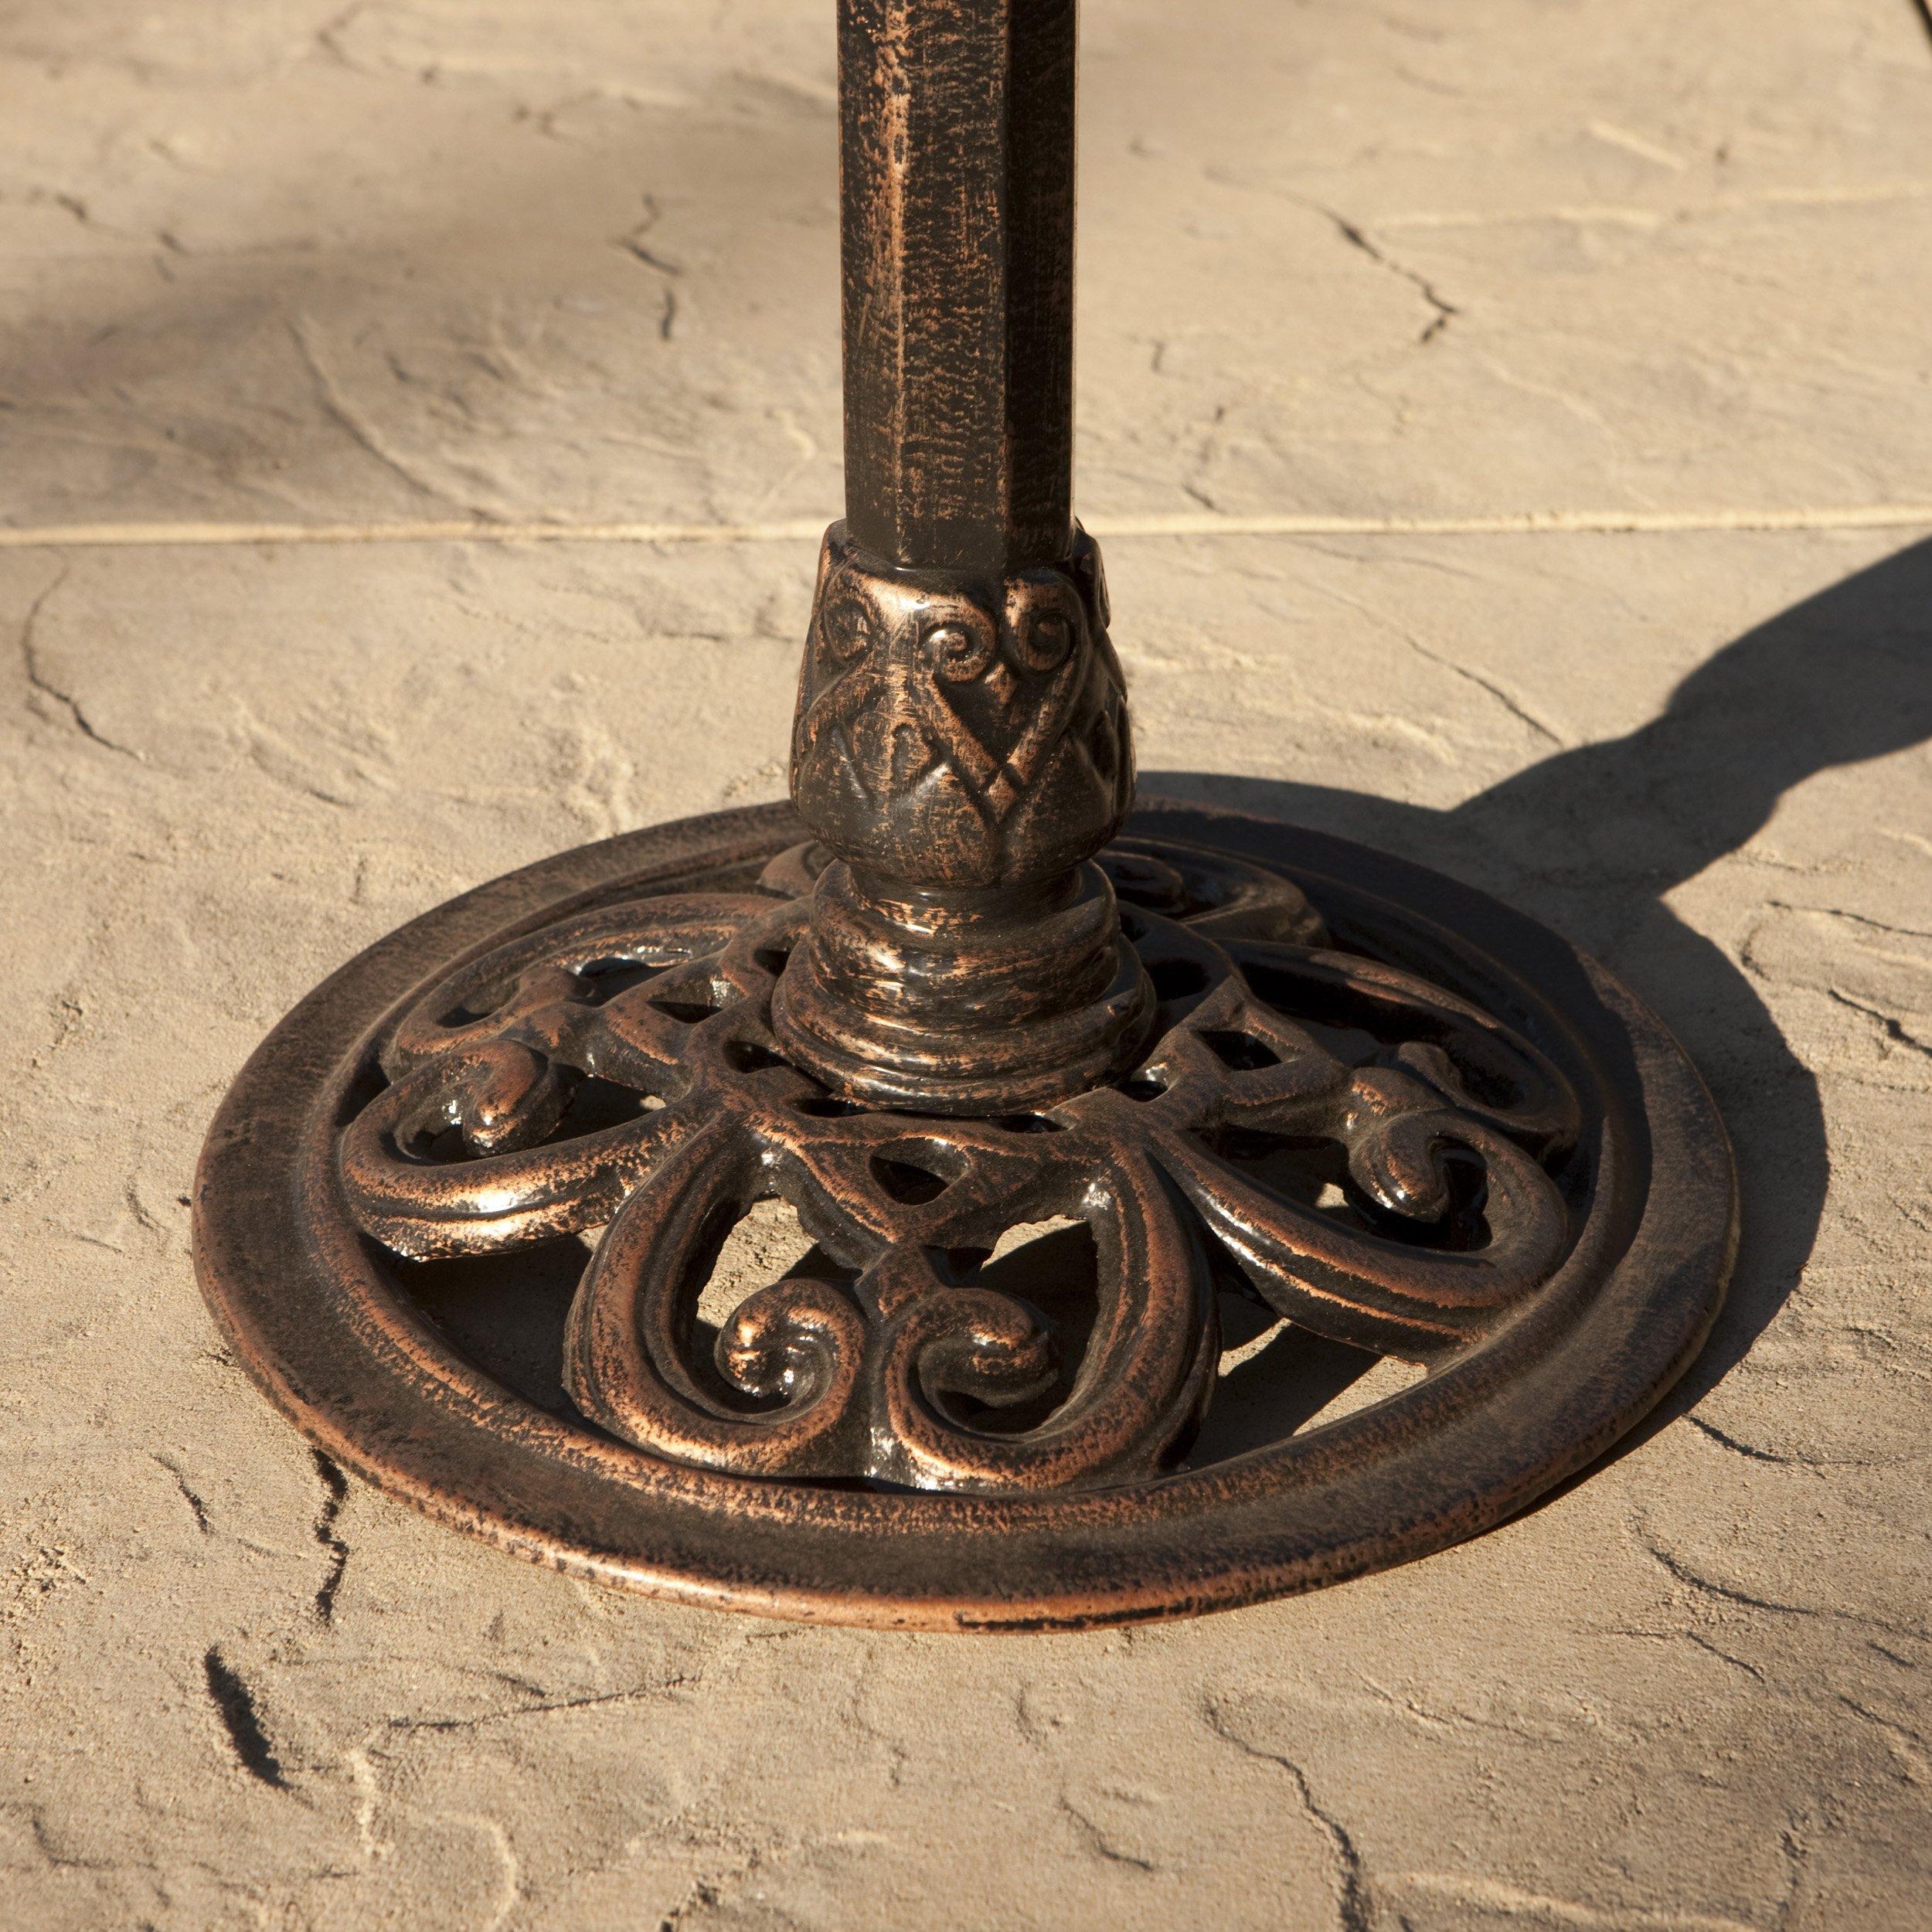 Best Selling Dia Sol Sun Dial, Antique Copper Finish